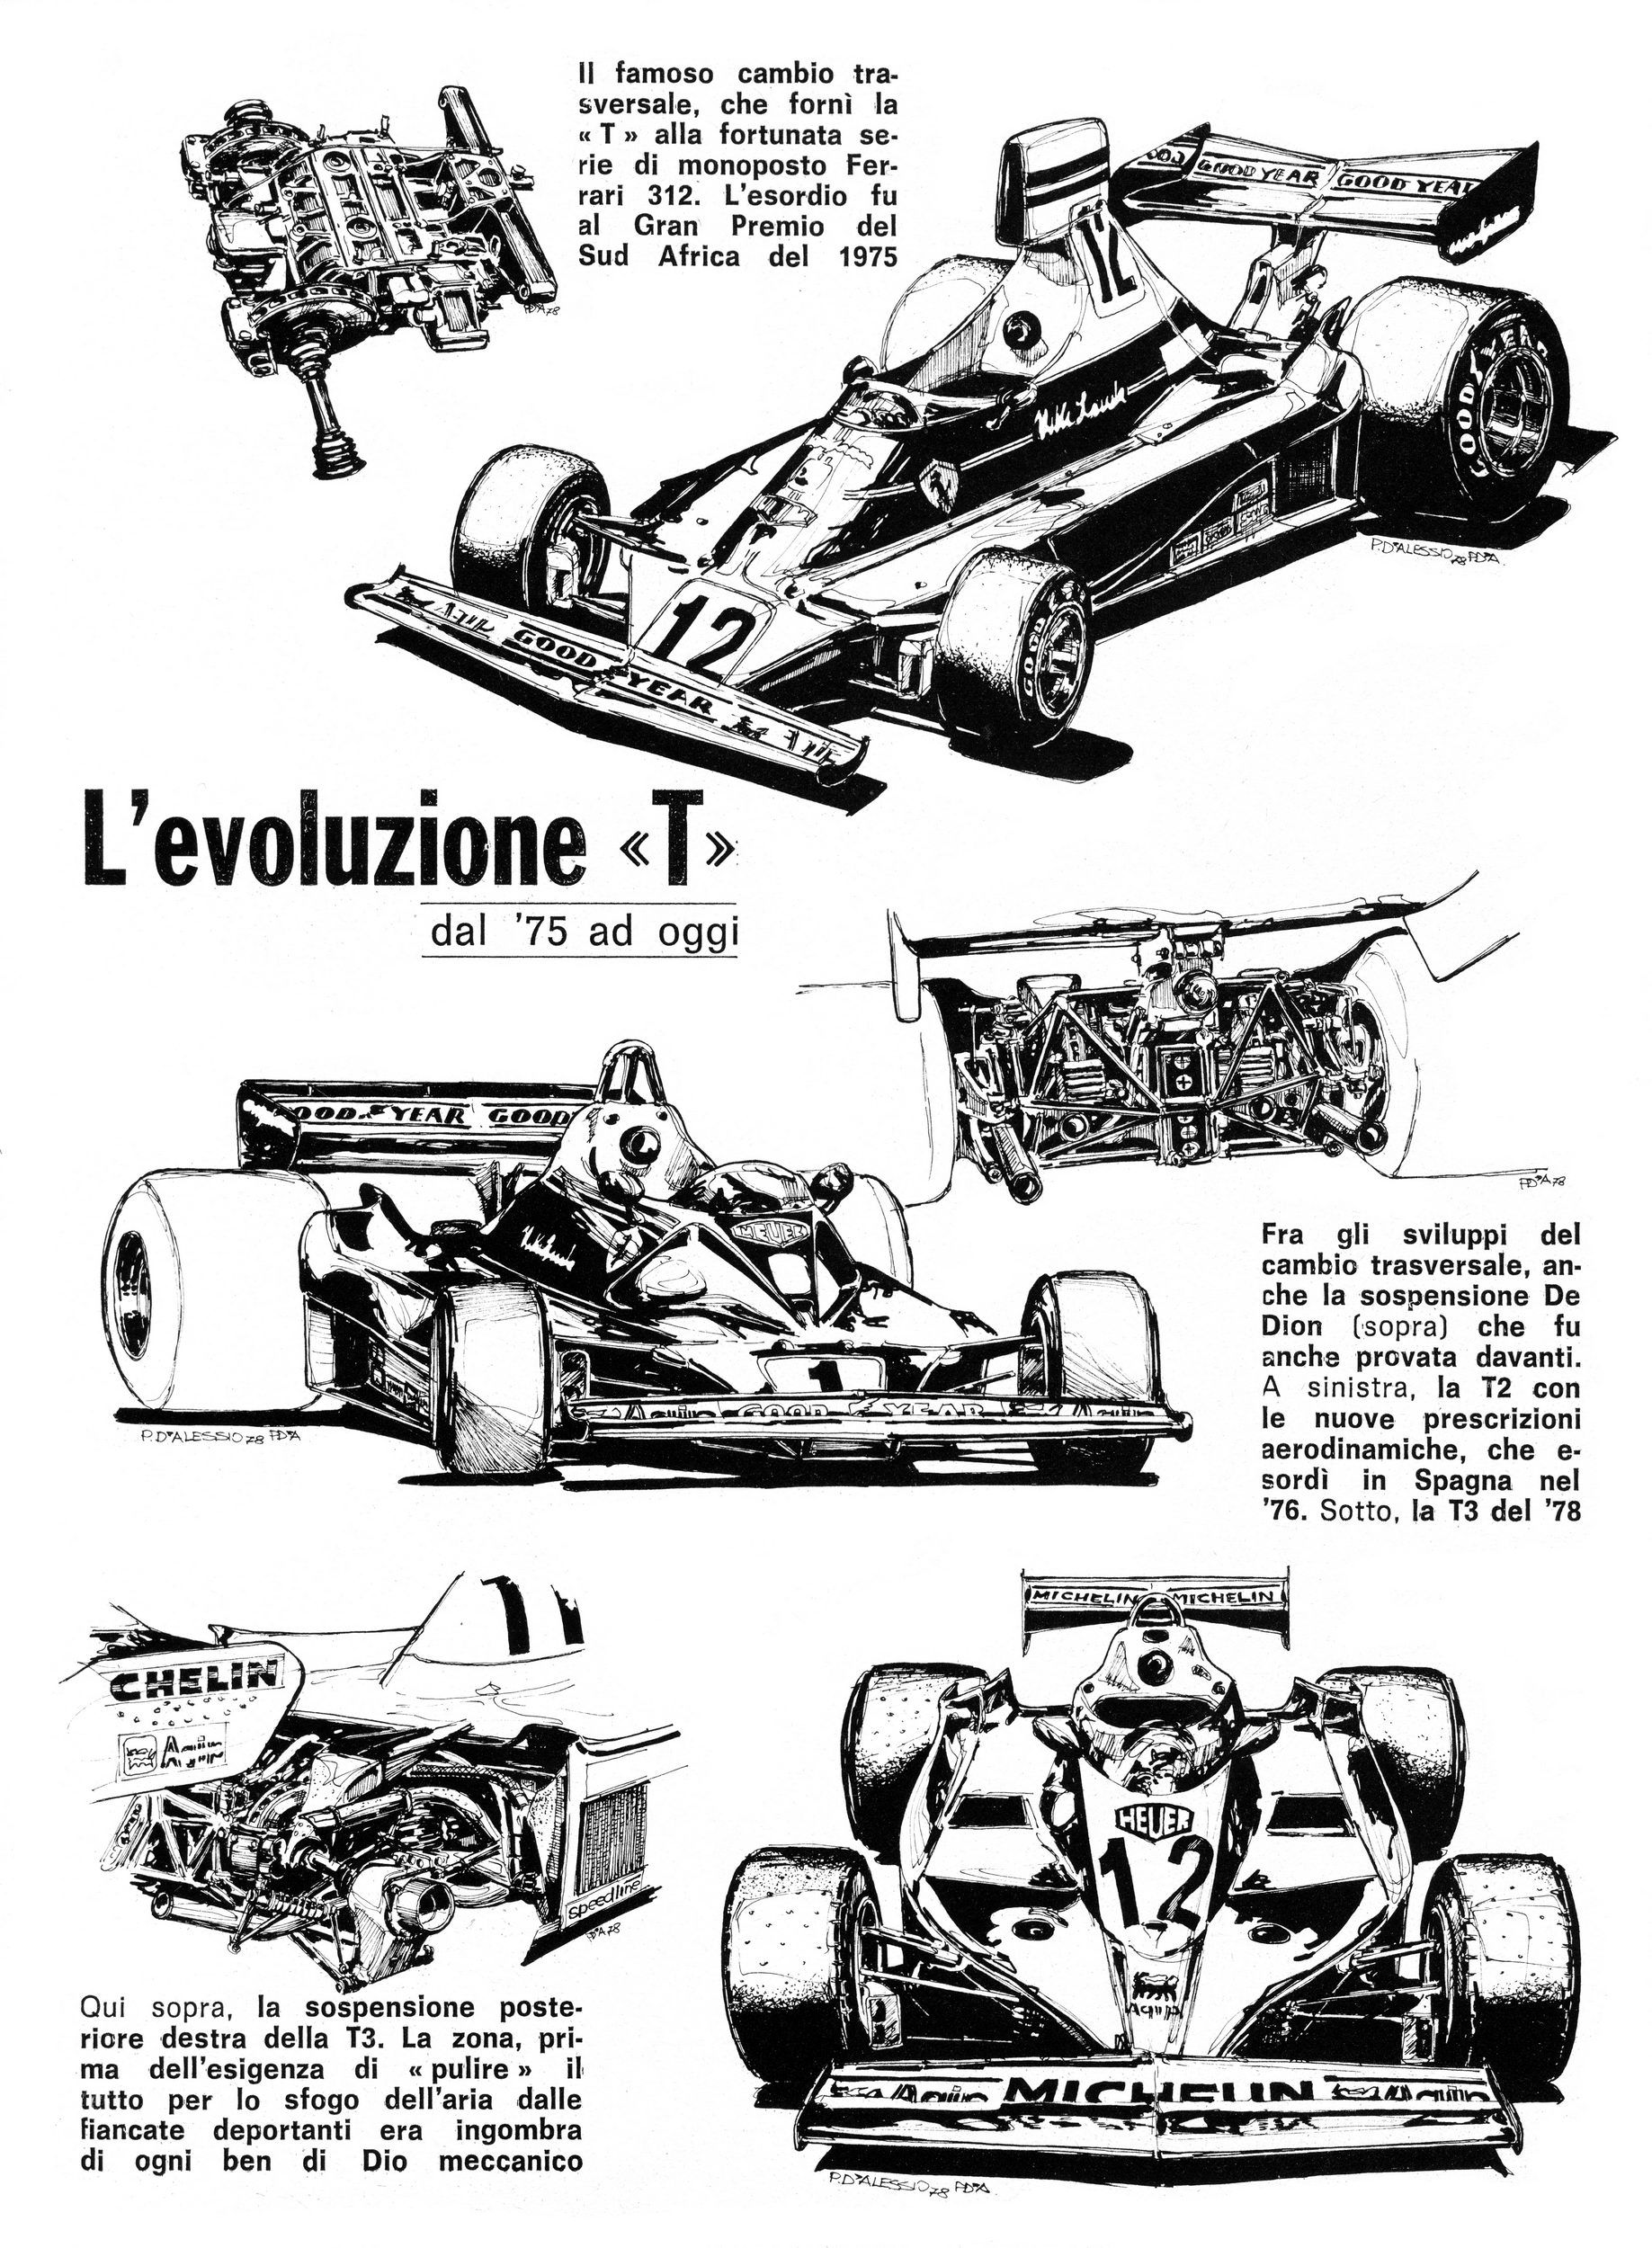 Ferrari 312 T Evolution Illustrated By Paolo D Alessio